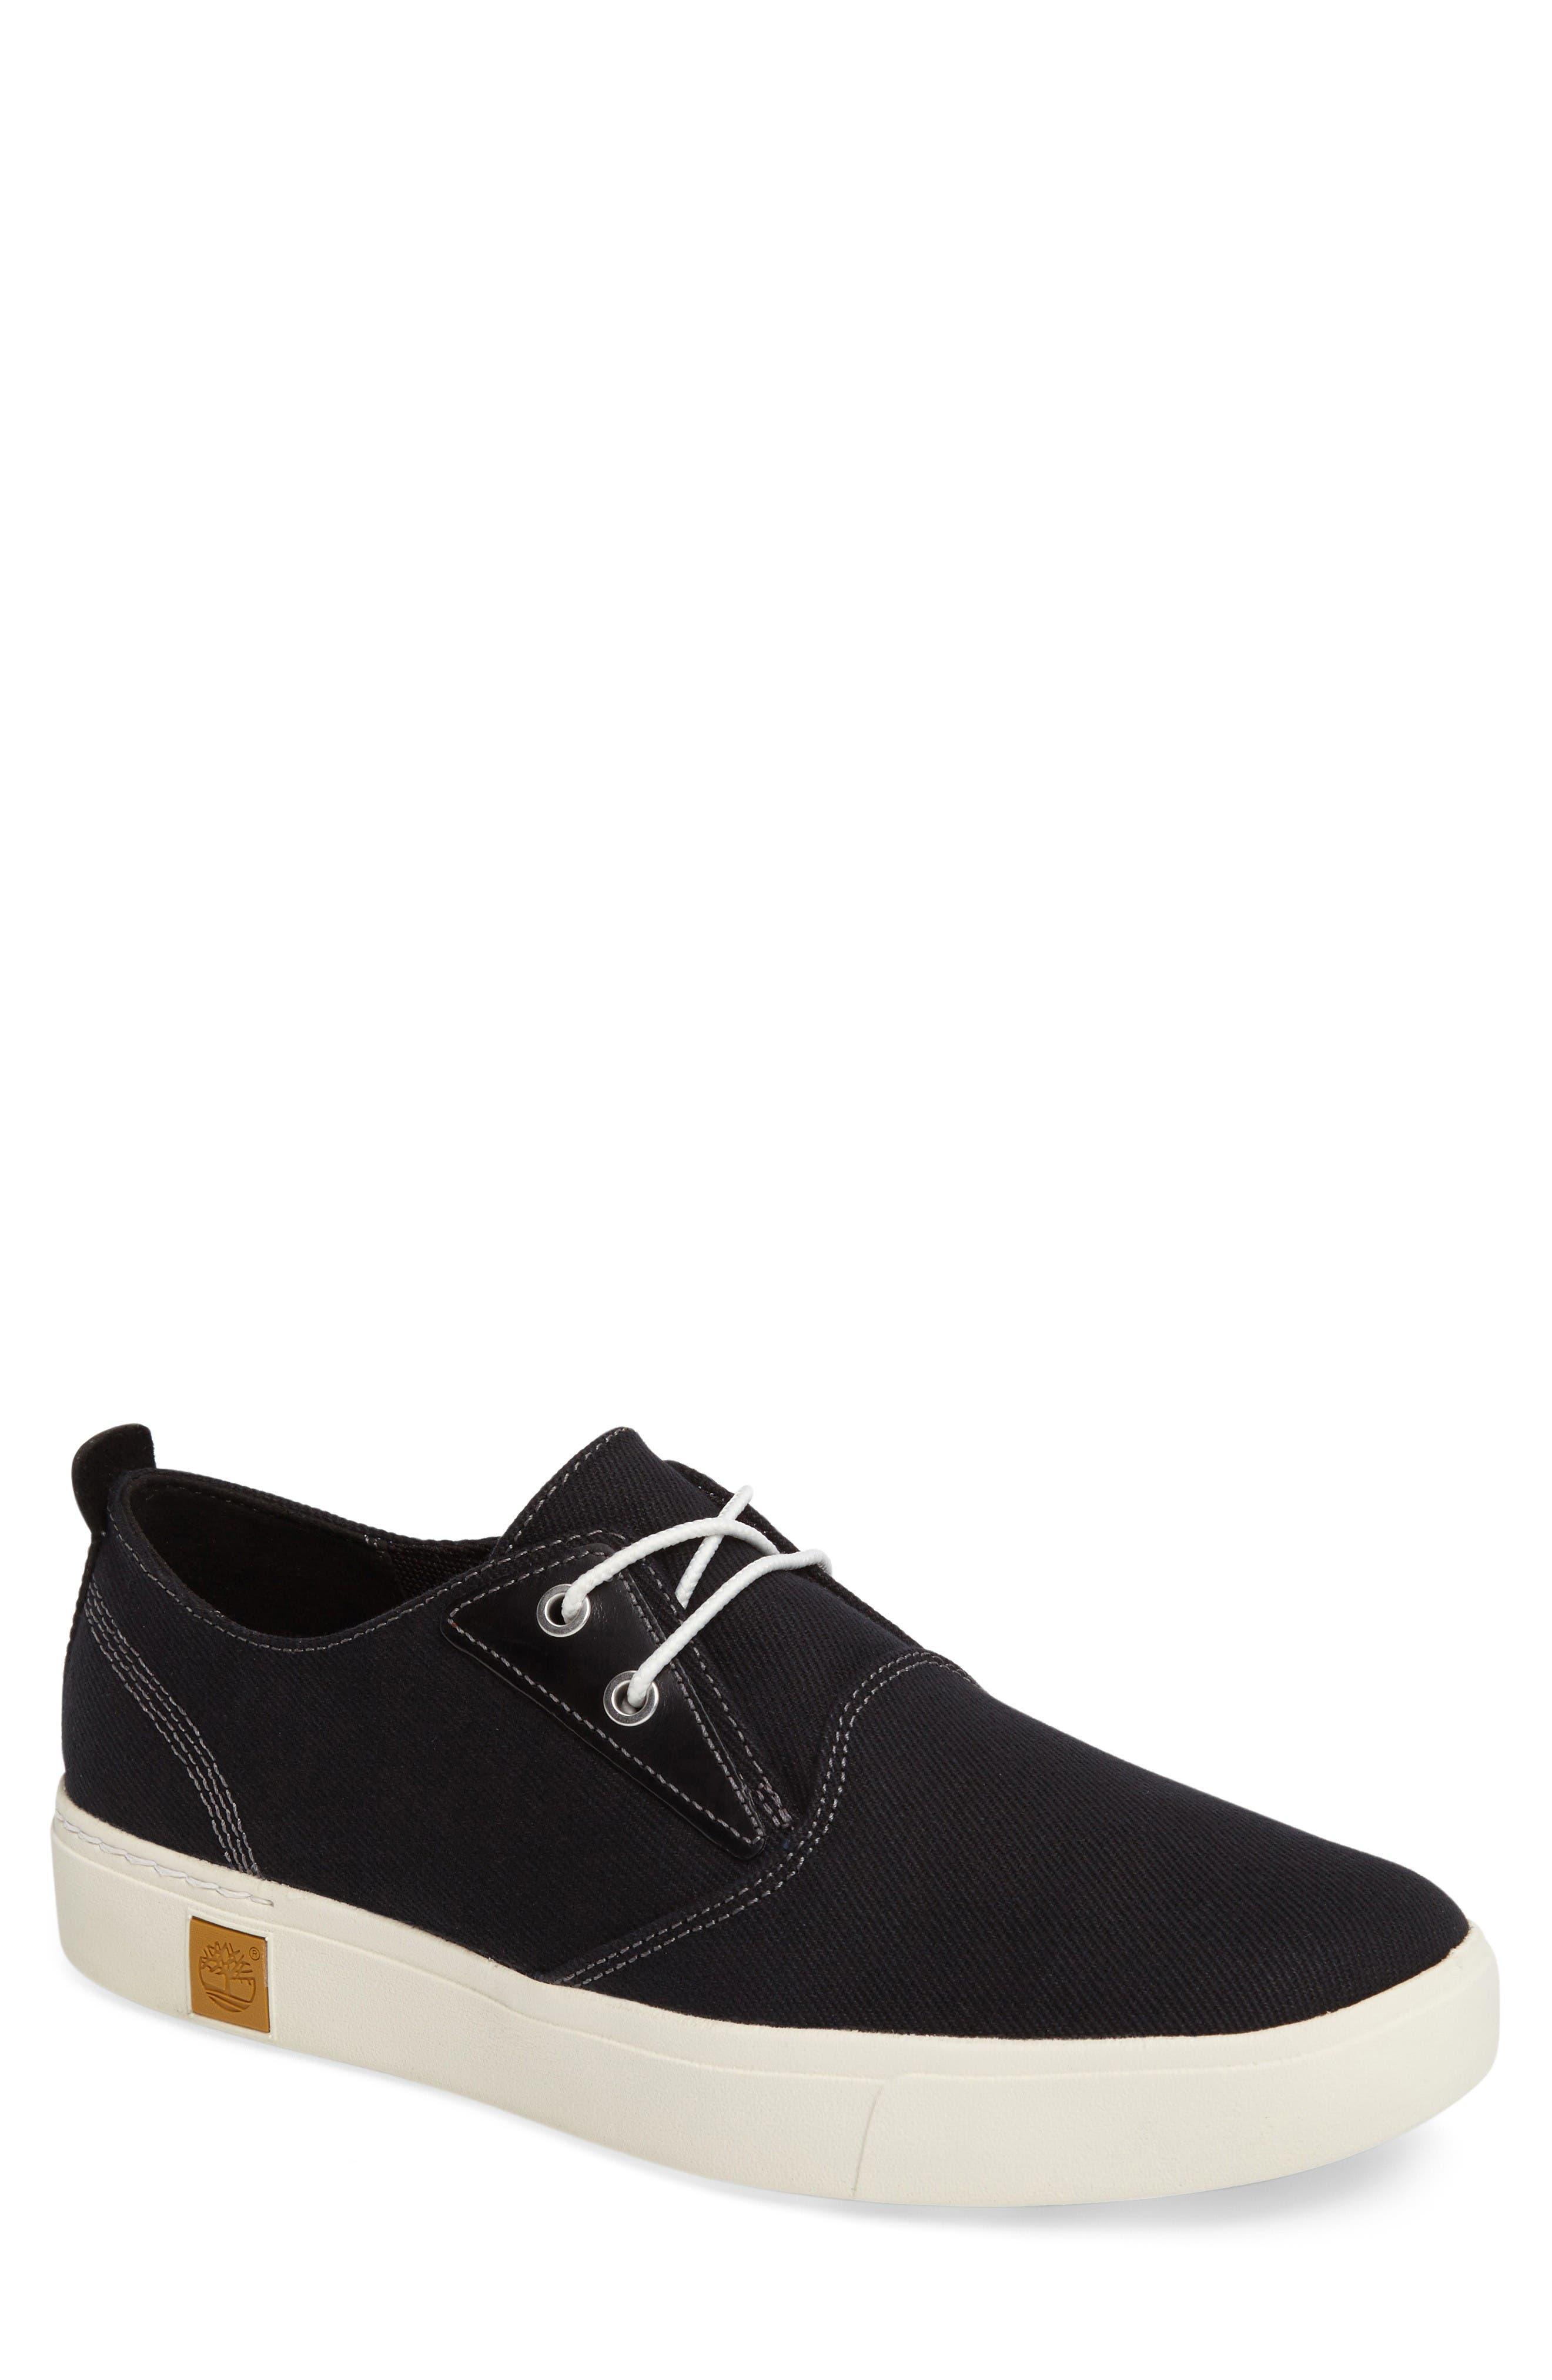 Timberland Amherst Sneaker (Men)